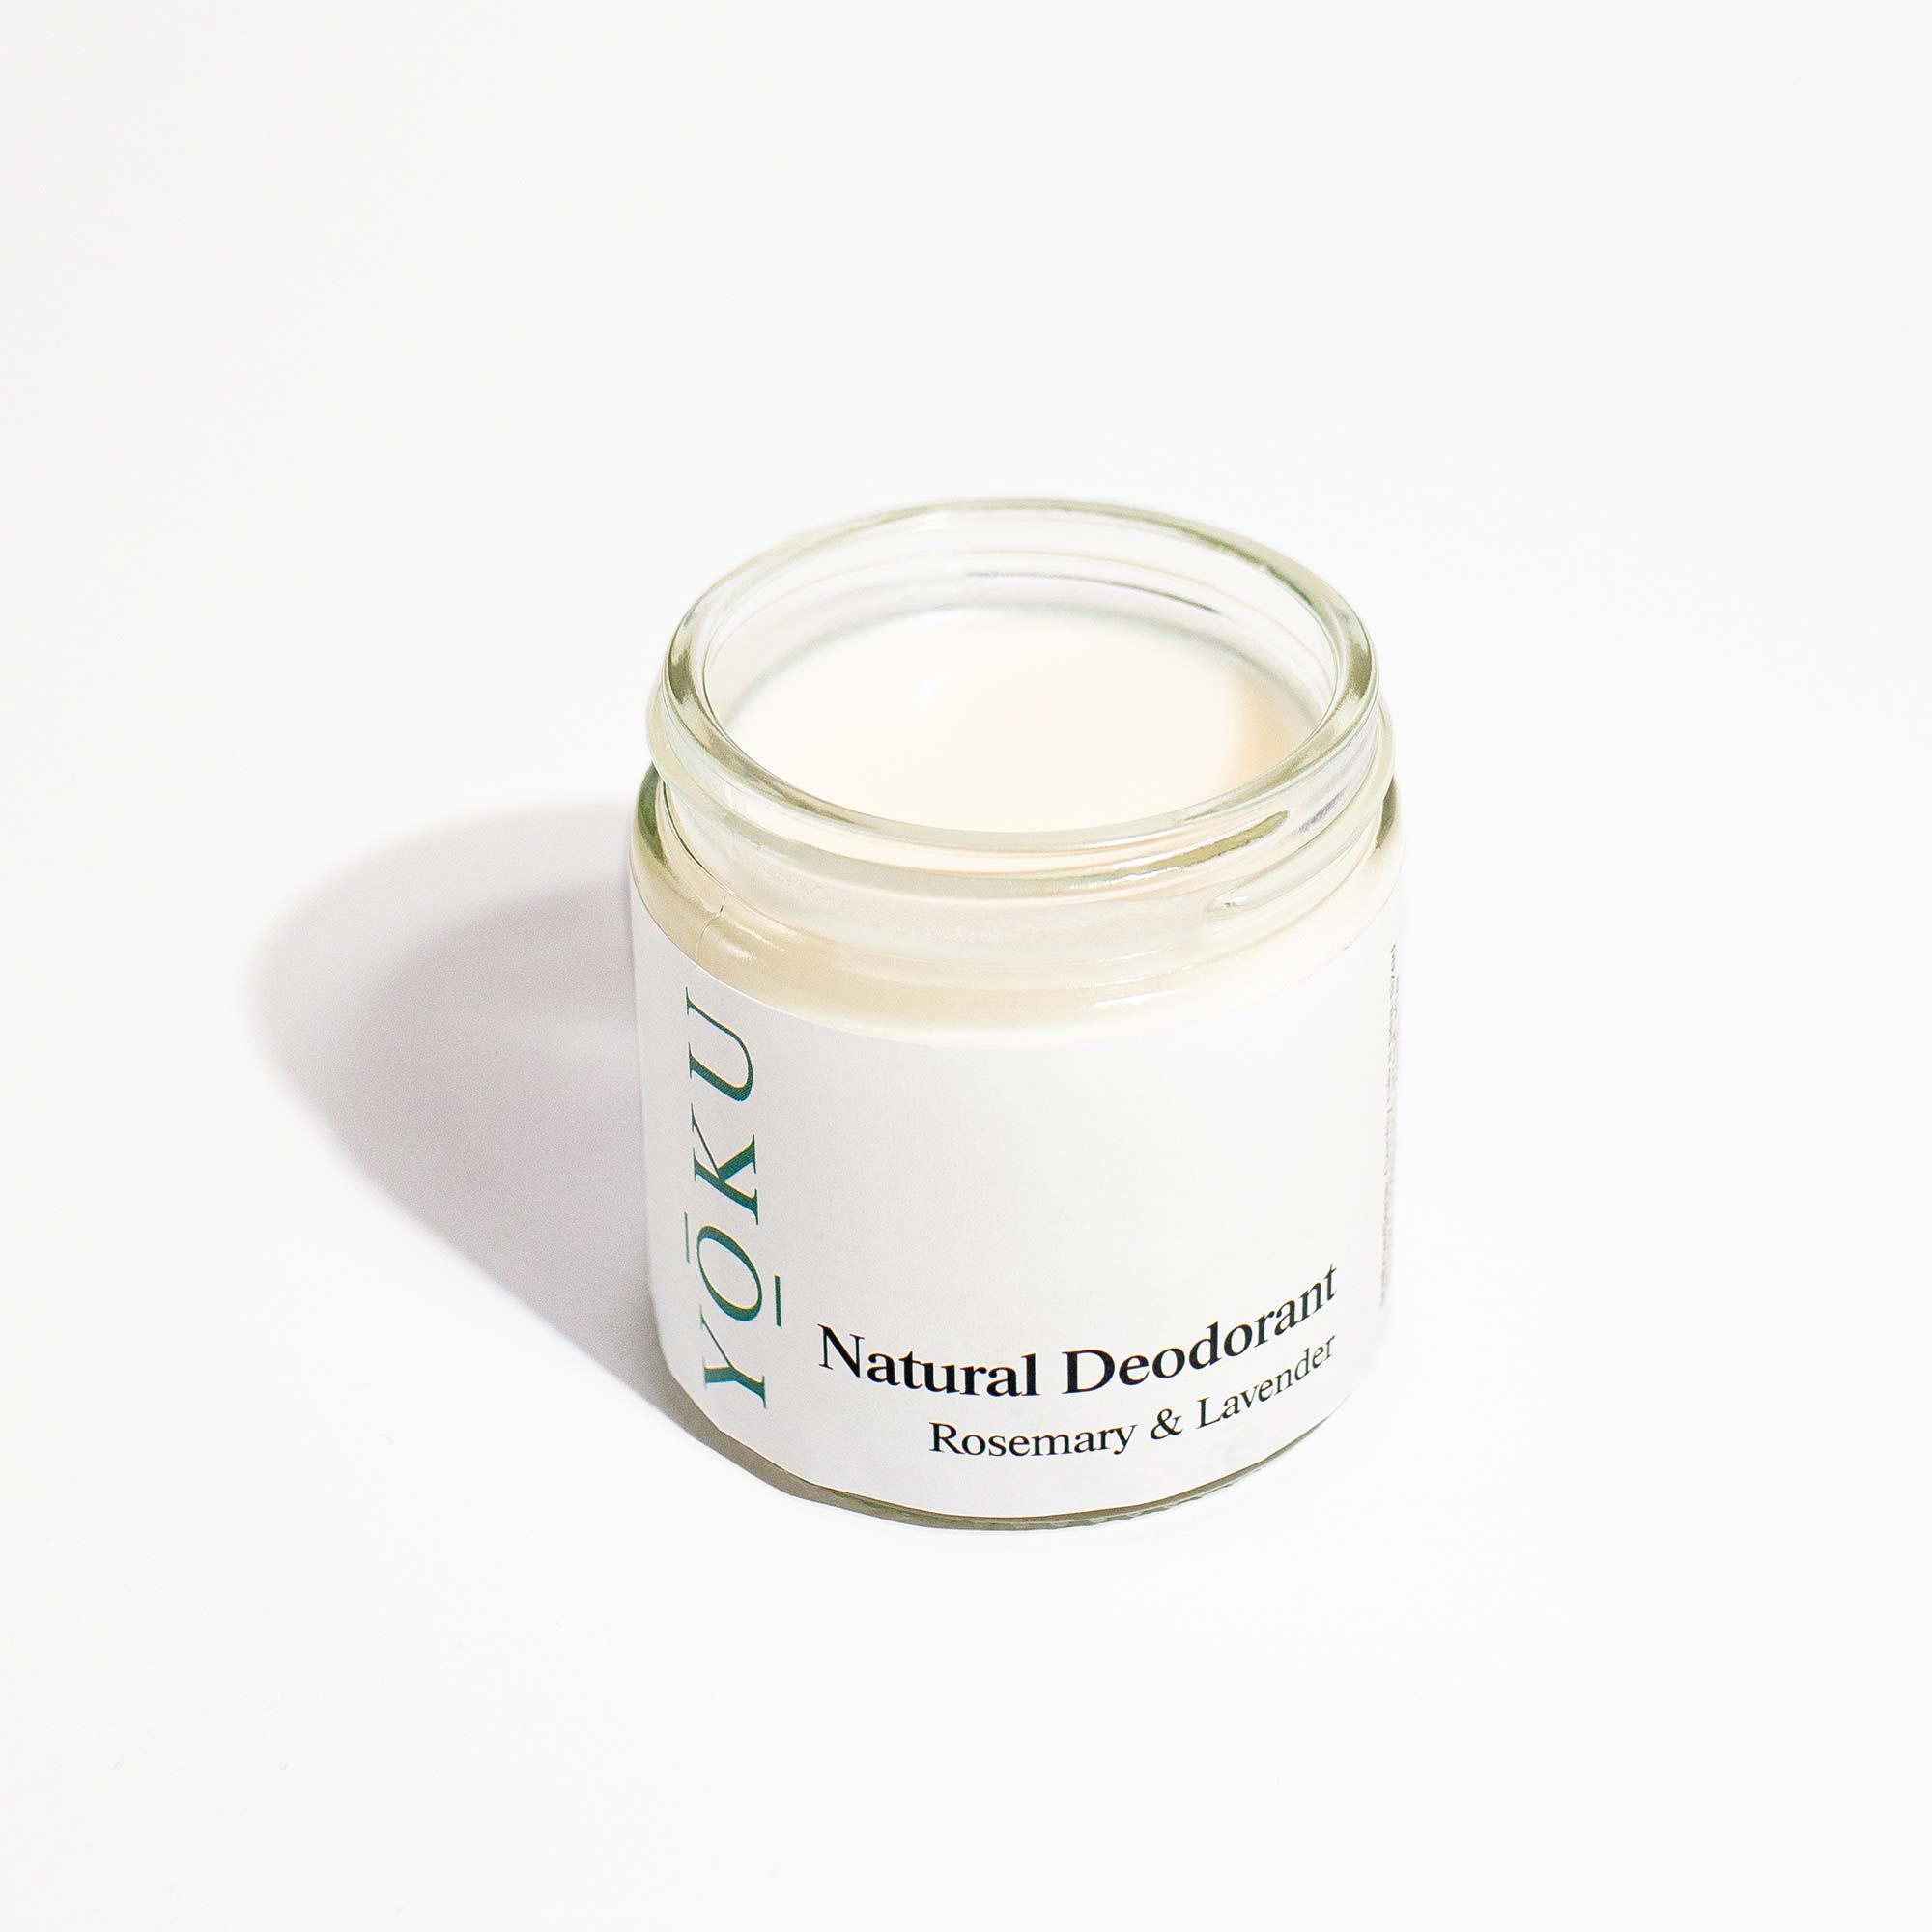 YOKU Natural Deodorants - Rosemary & Lavender 2